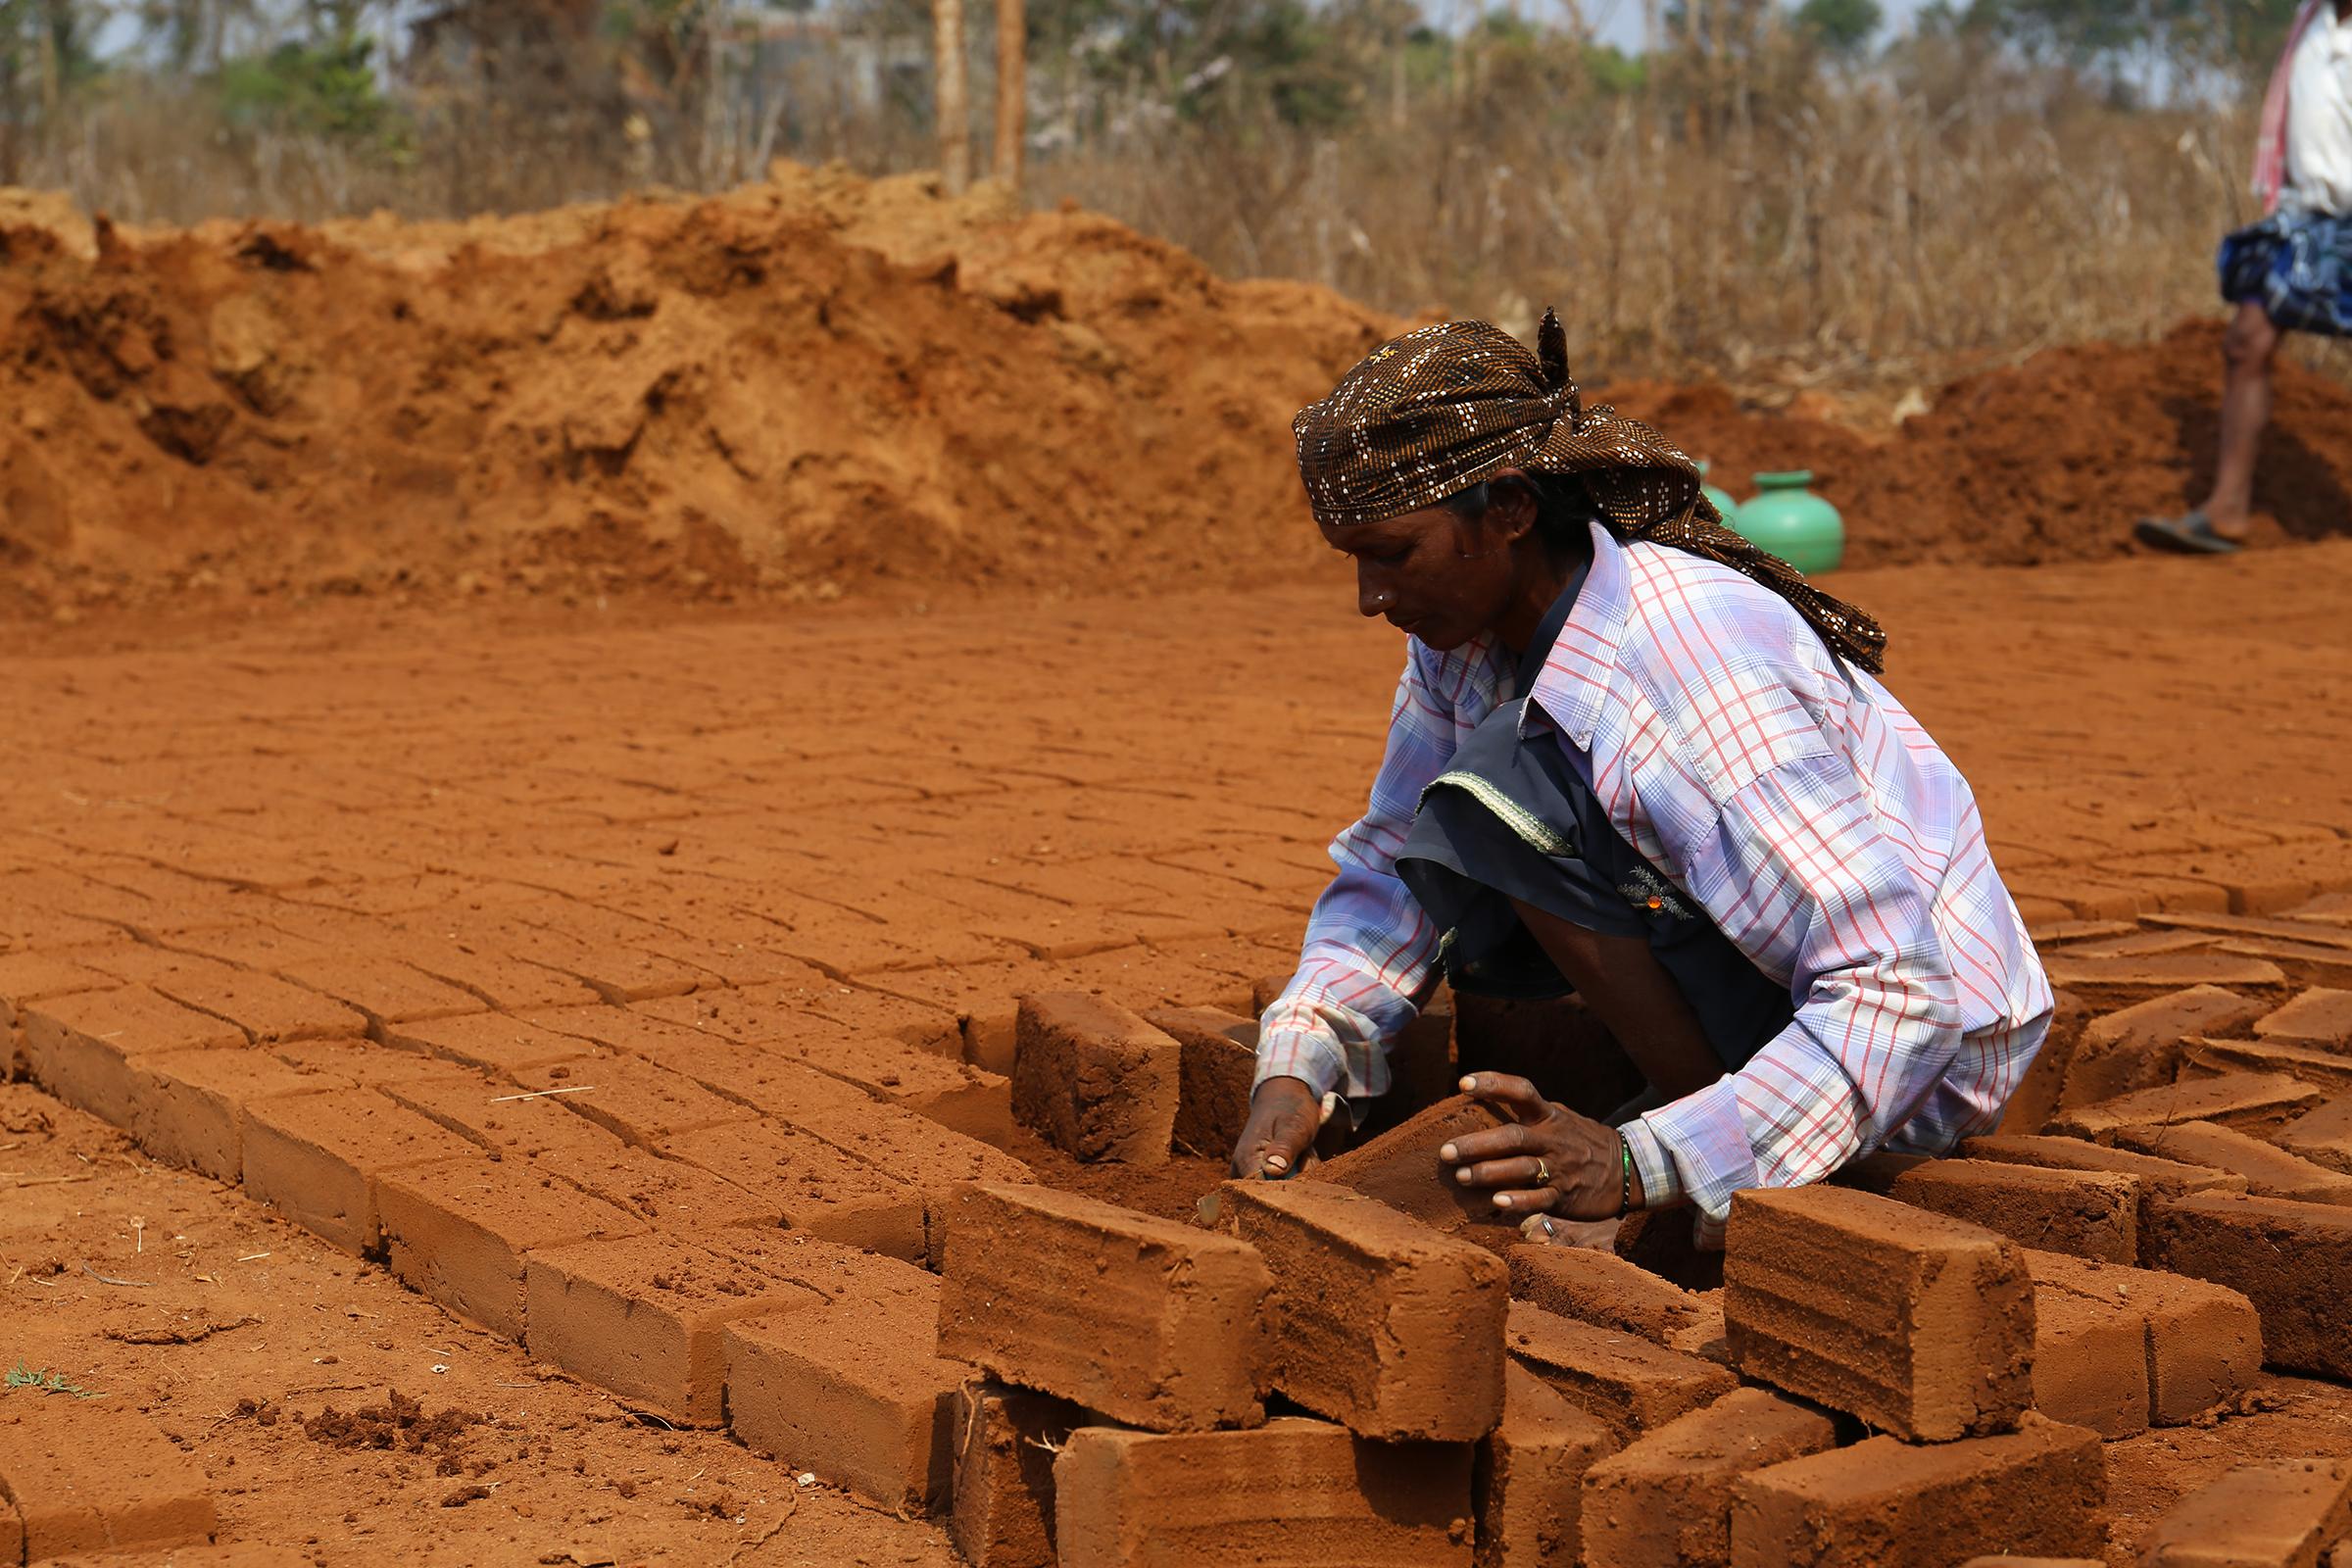 A community enterprise brick maker